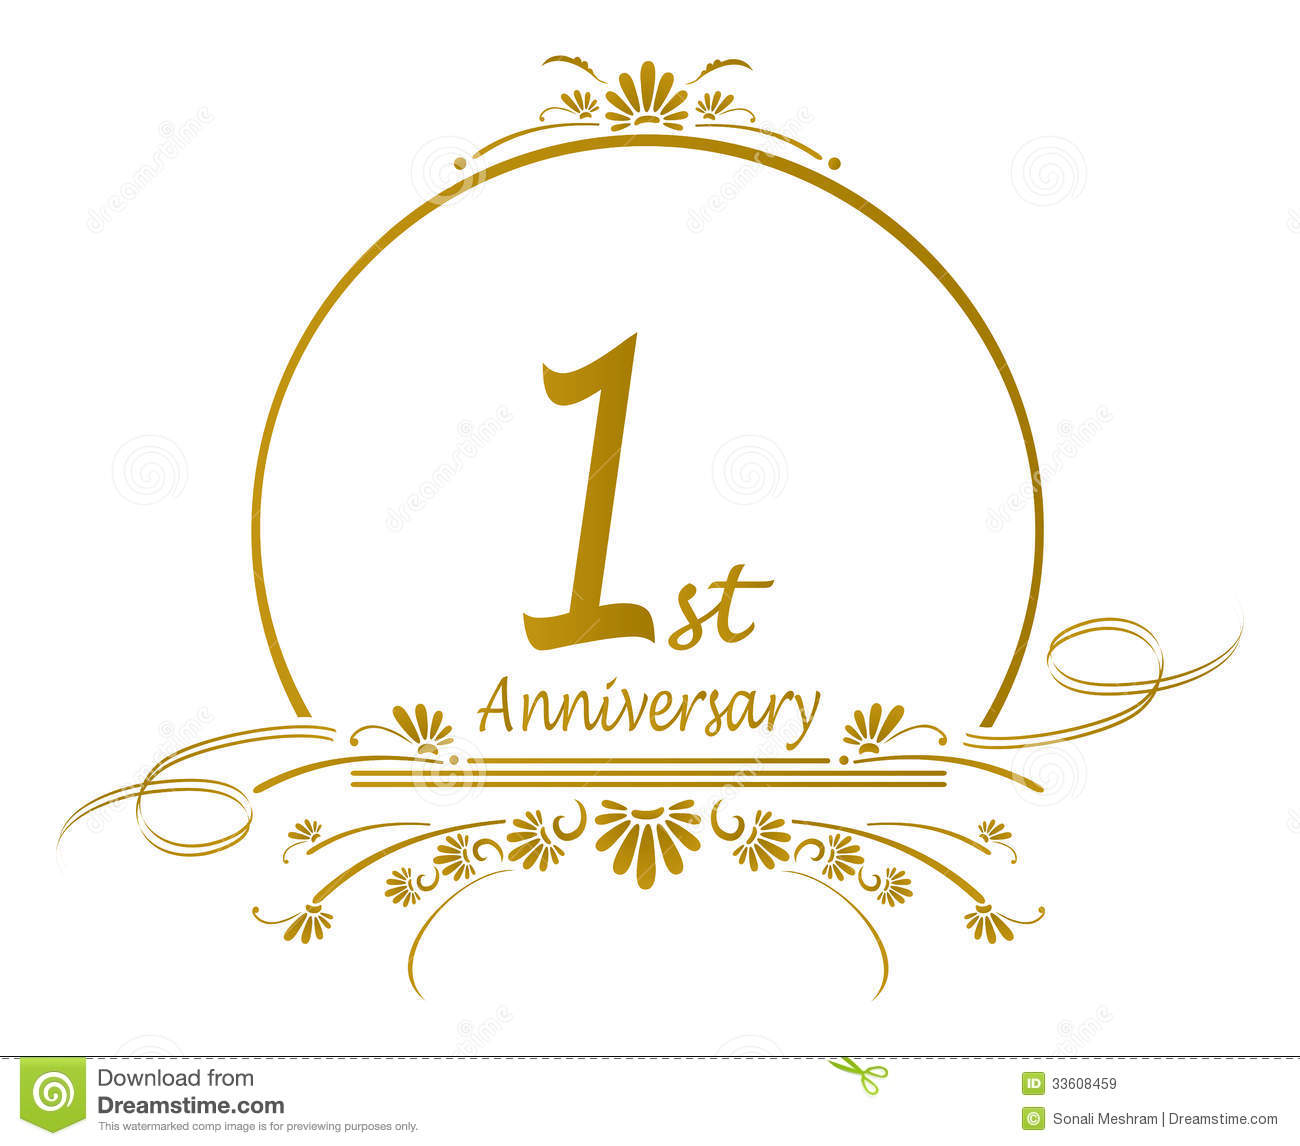 Anniversary clipart 1st.  st